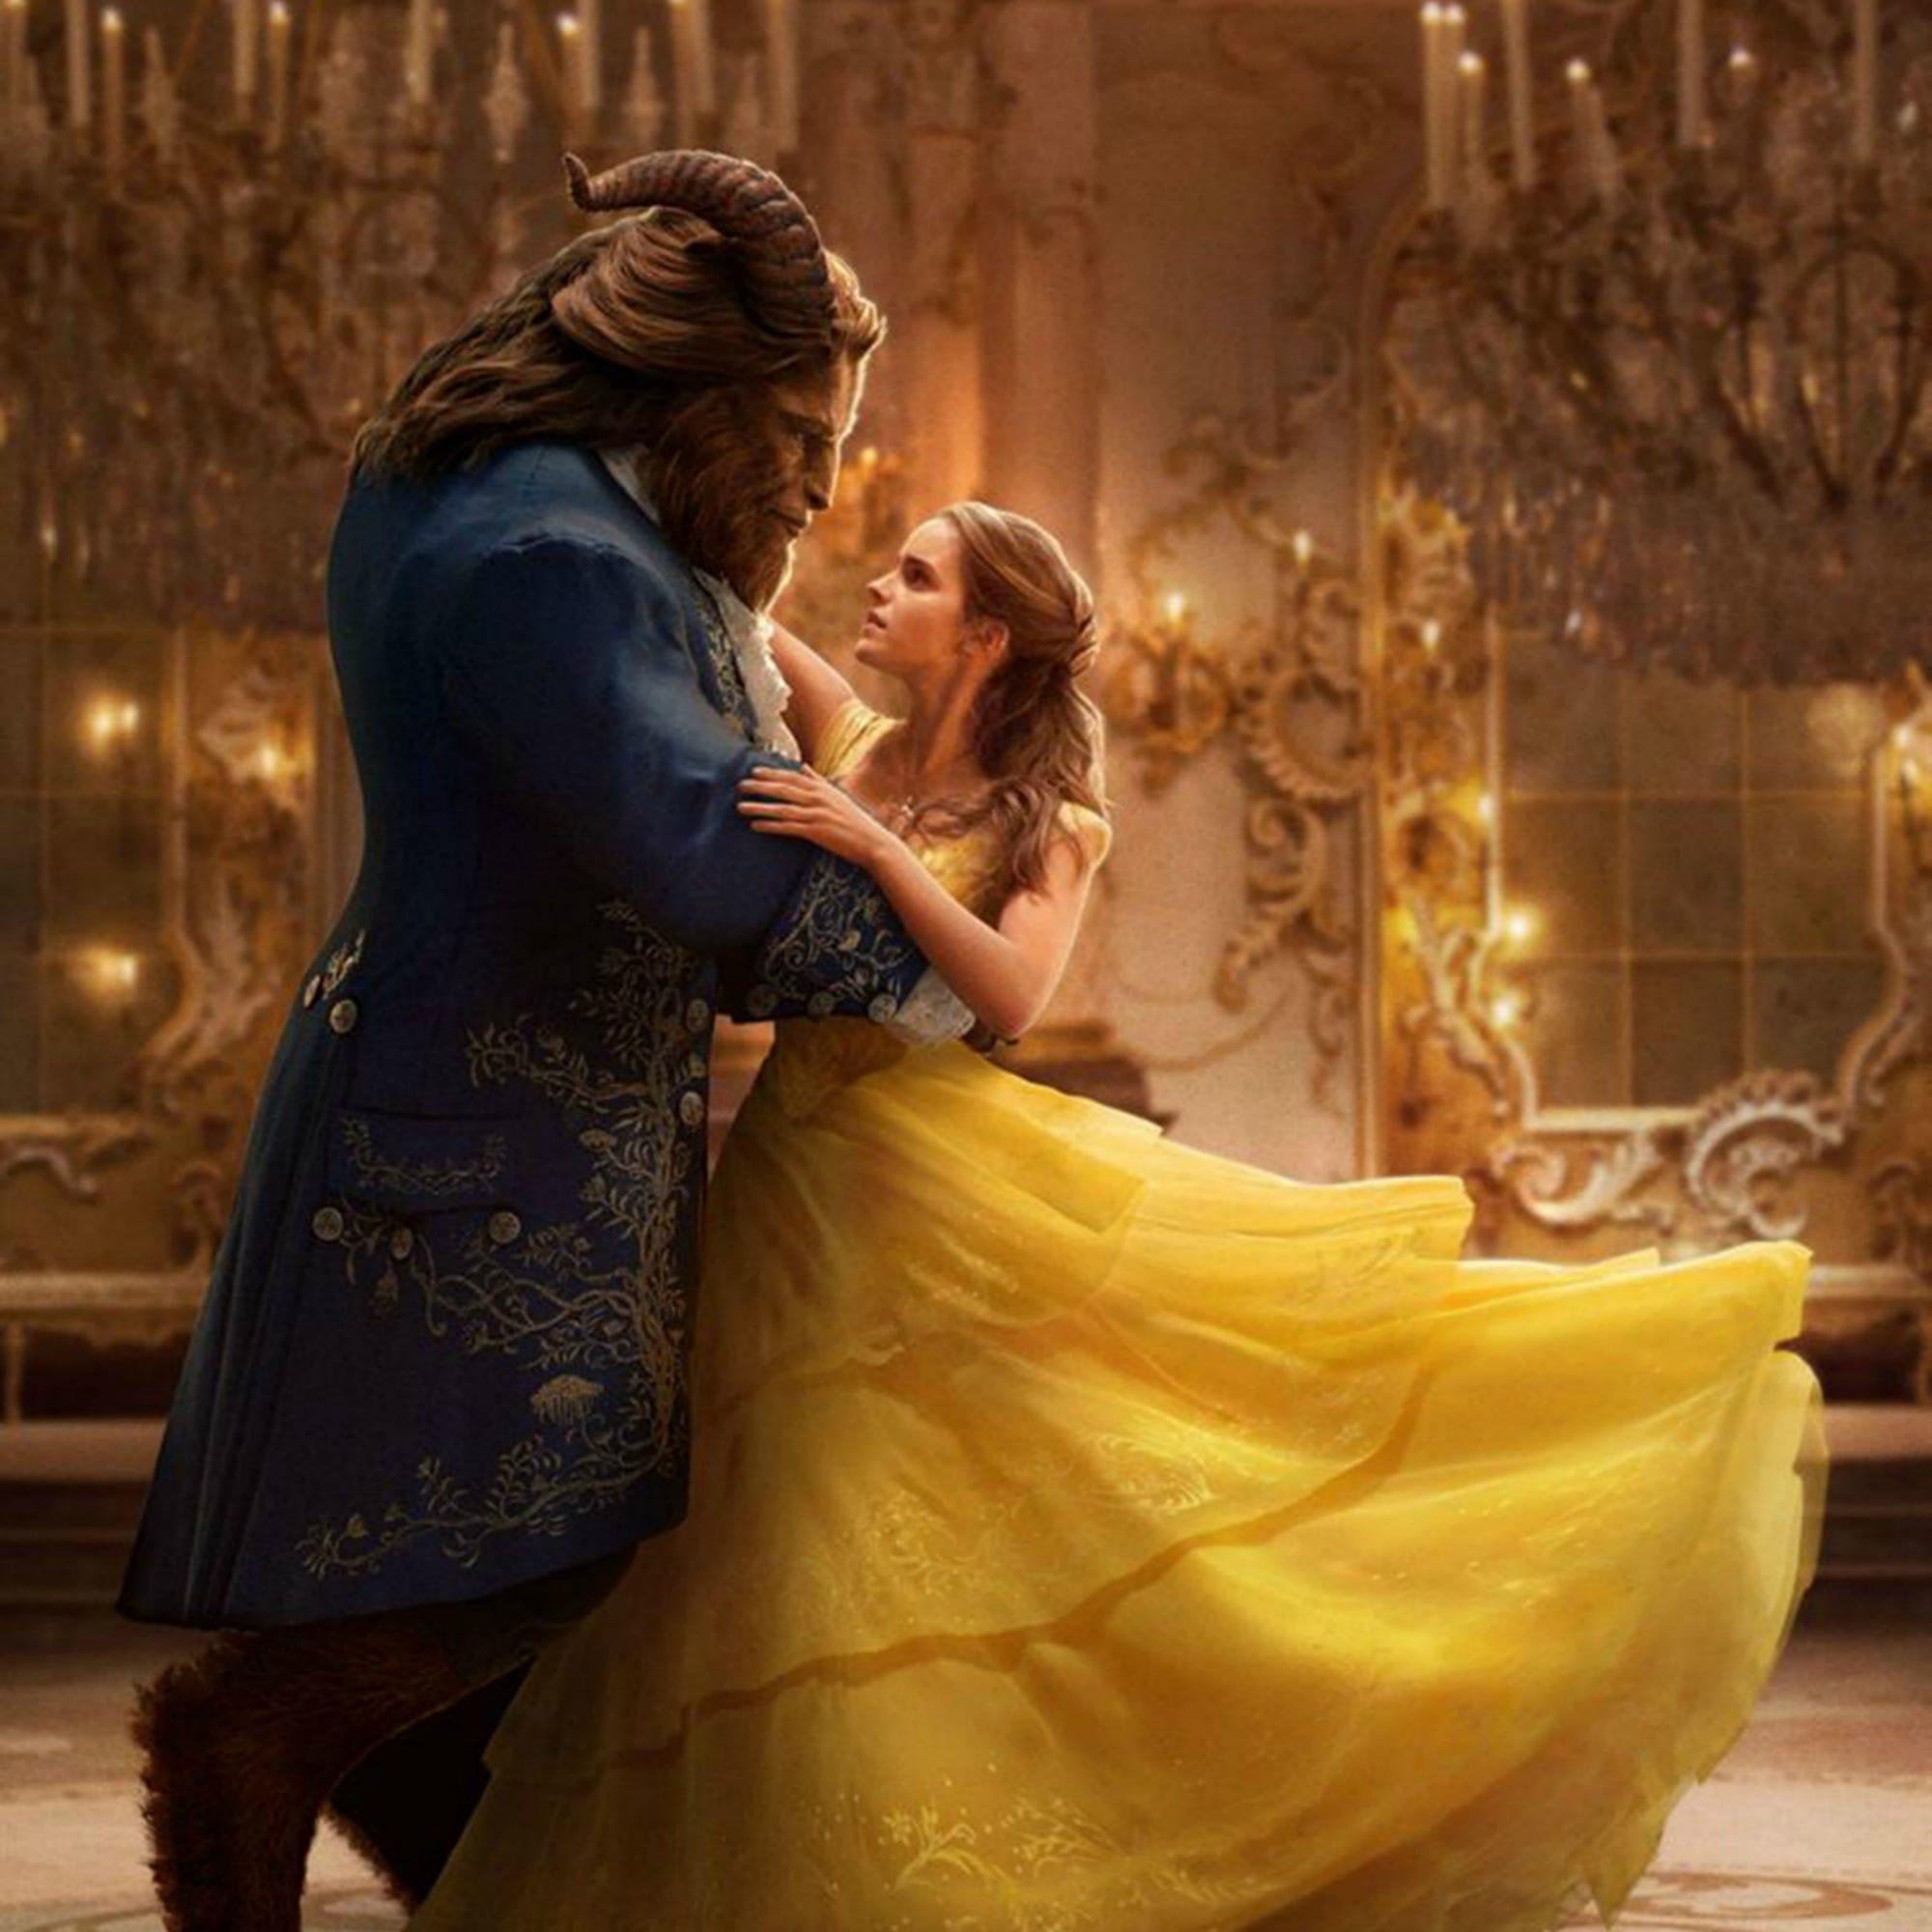 Emma Watson Beauty And The Beast Belle Wedding Dress